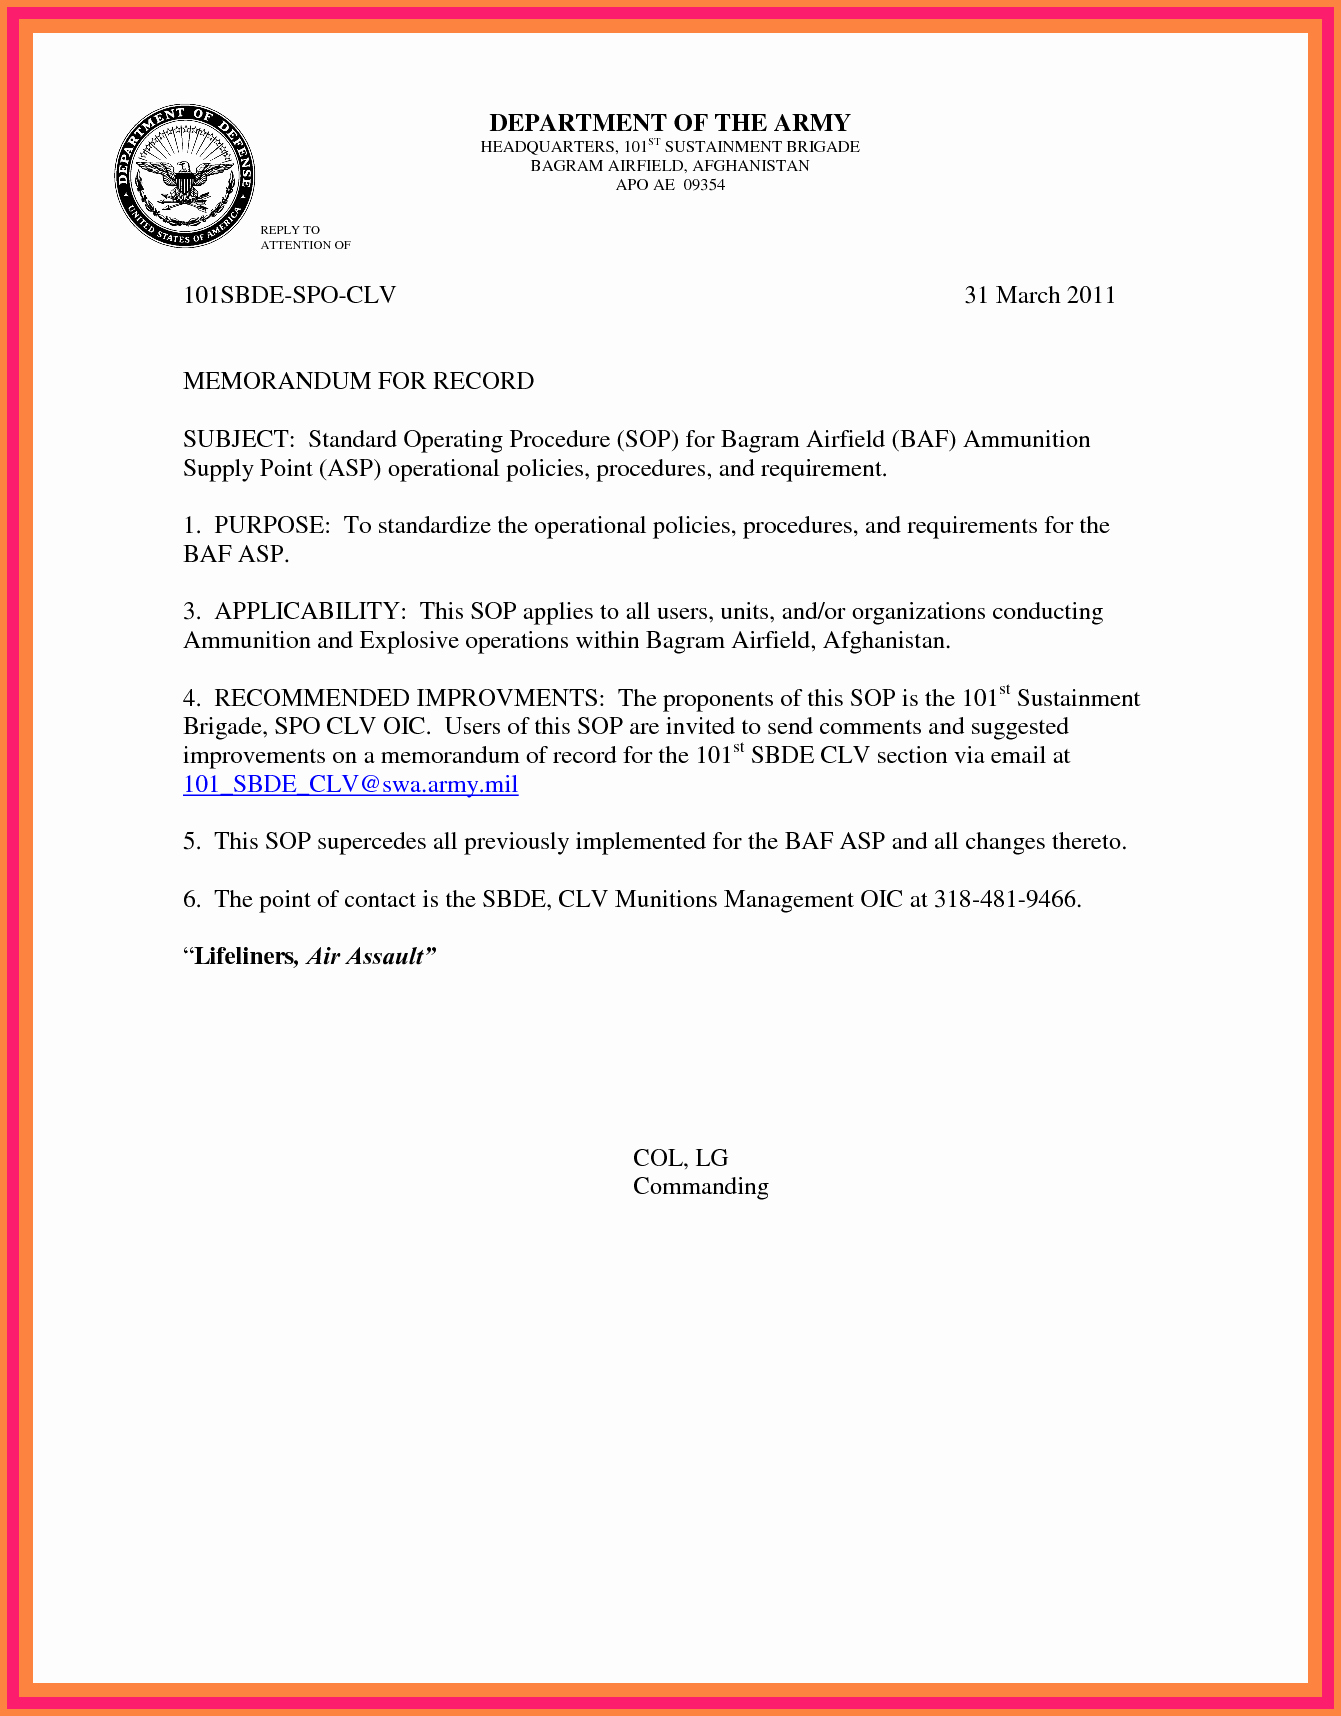 Memorandum Of Record Template Inspirational 6 Memorandum for Record Army Example